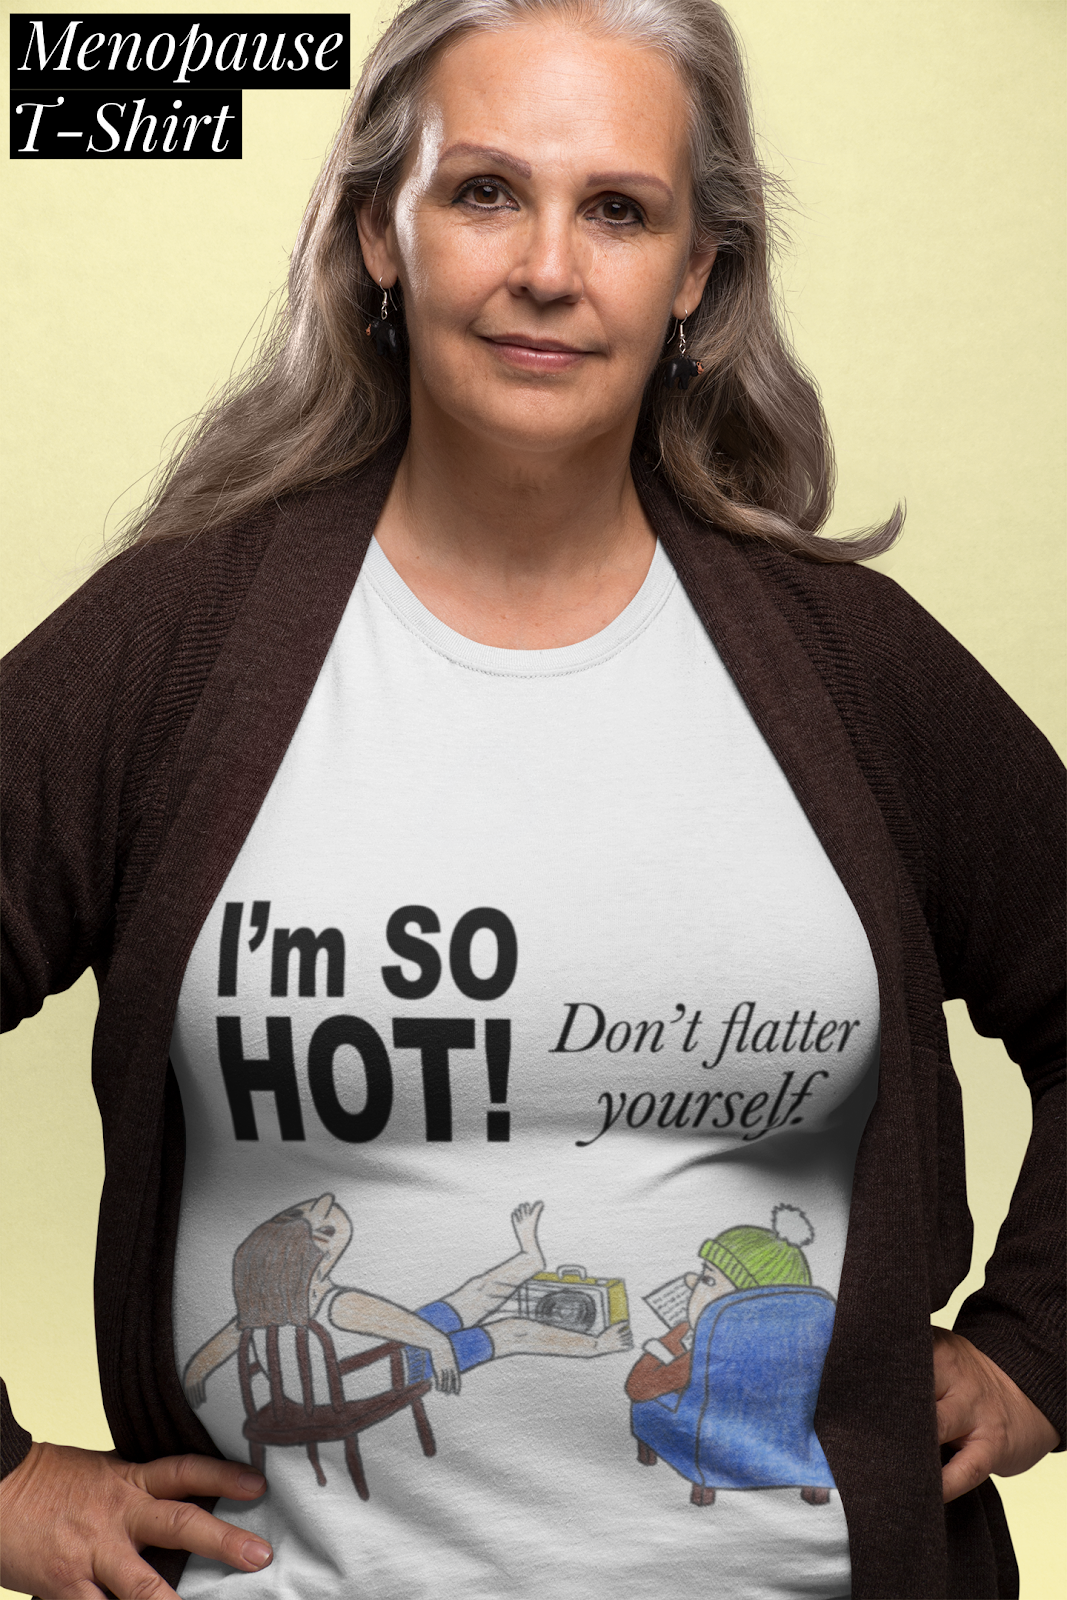 The Menopause Shirt